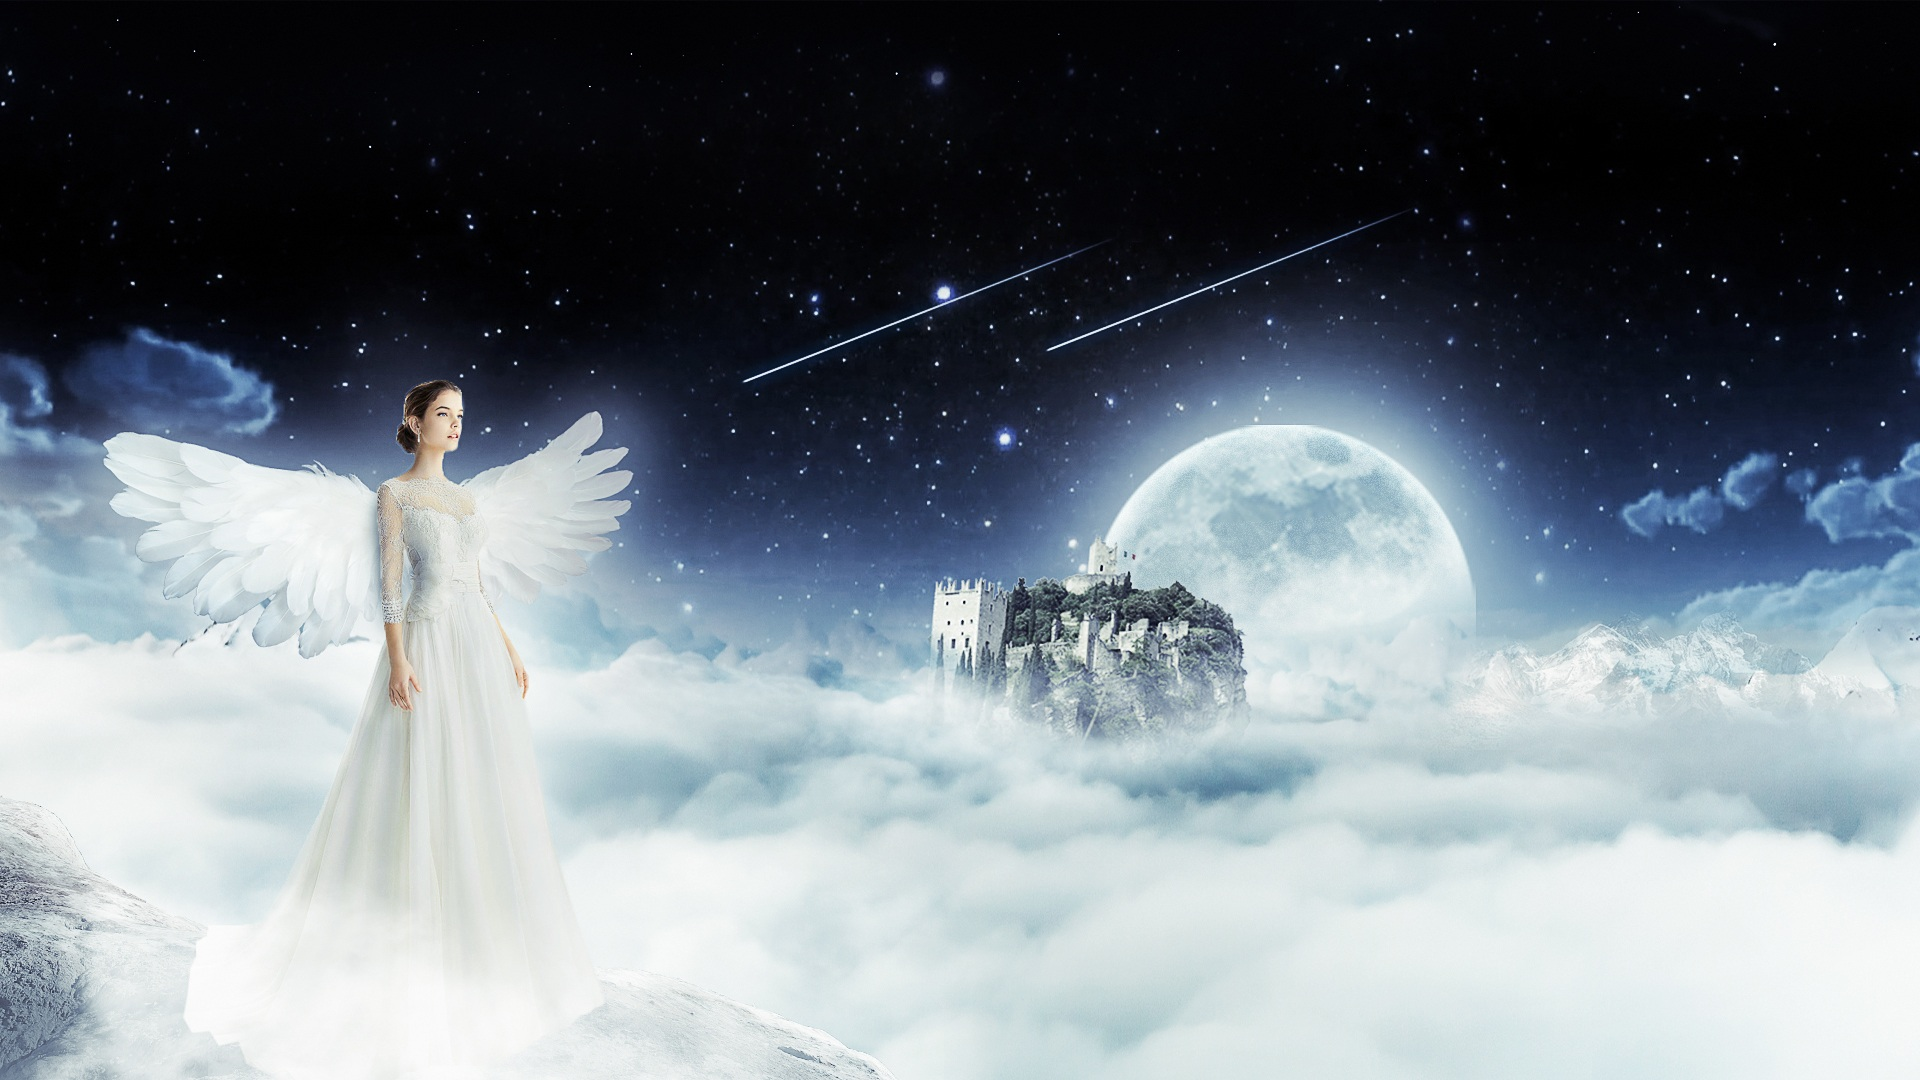 Anjo, mulher, Céu, nuvens, Lua - Papéis de parede HD - Professor-falken.com